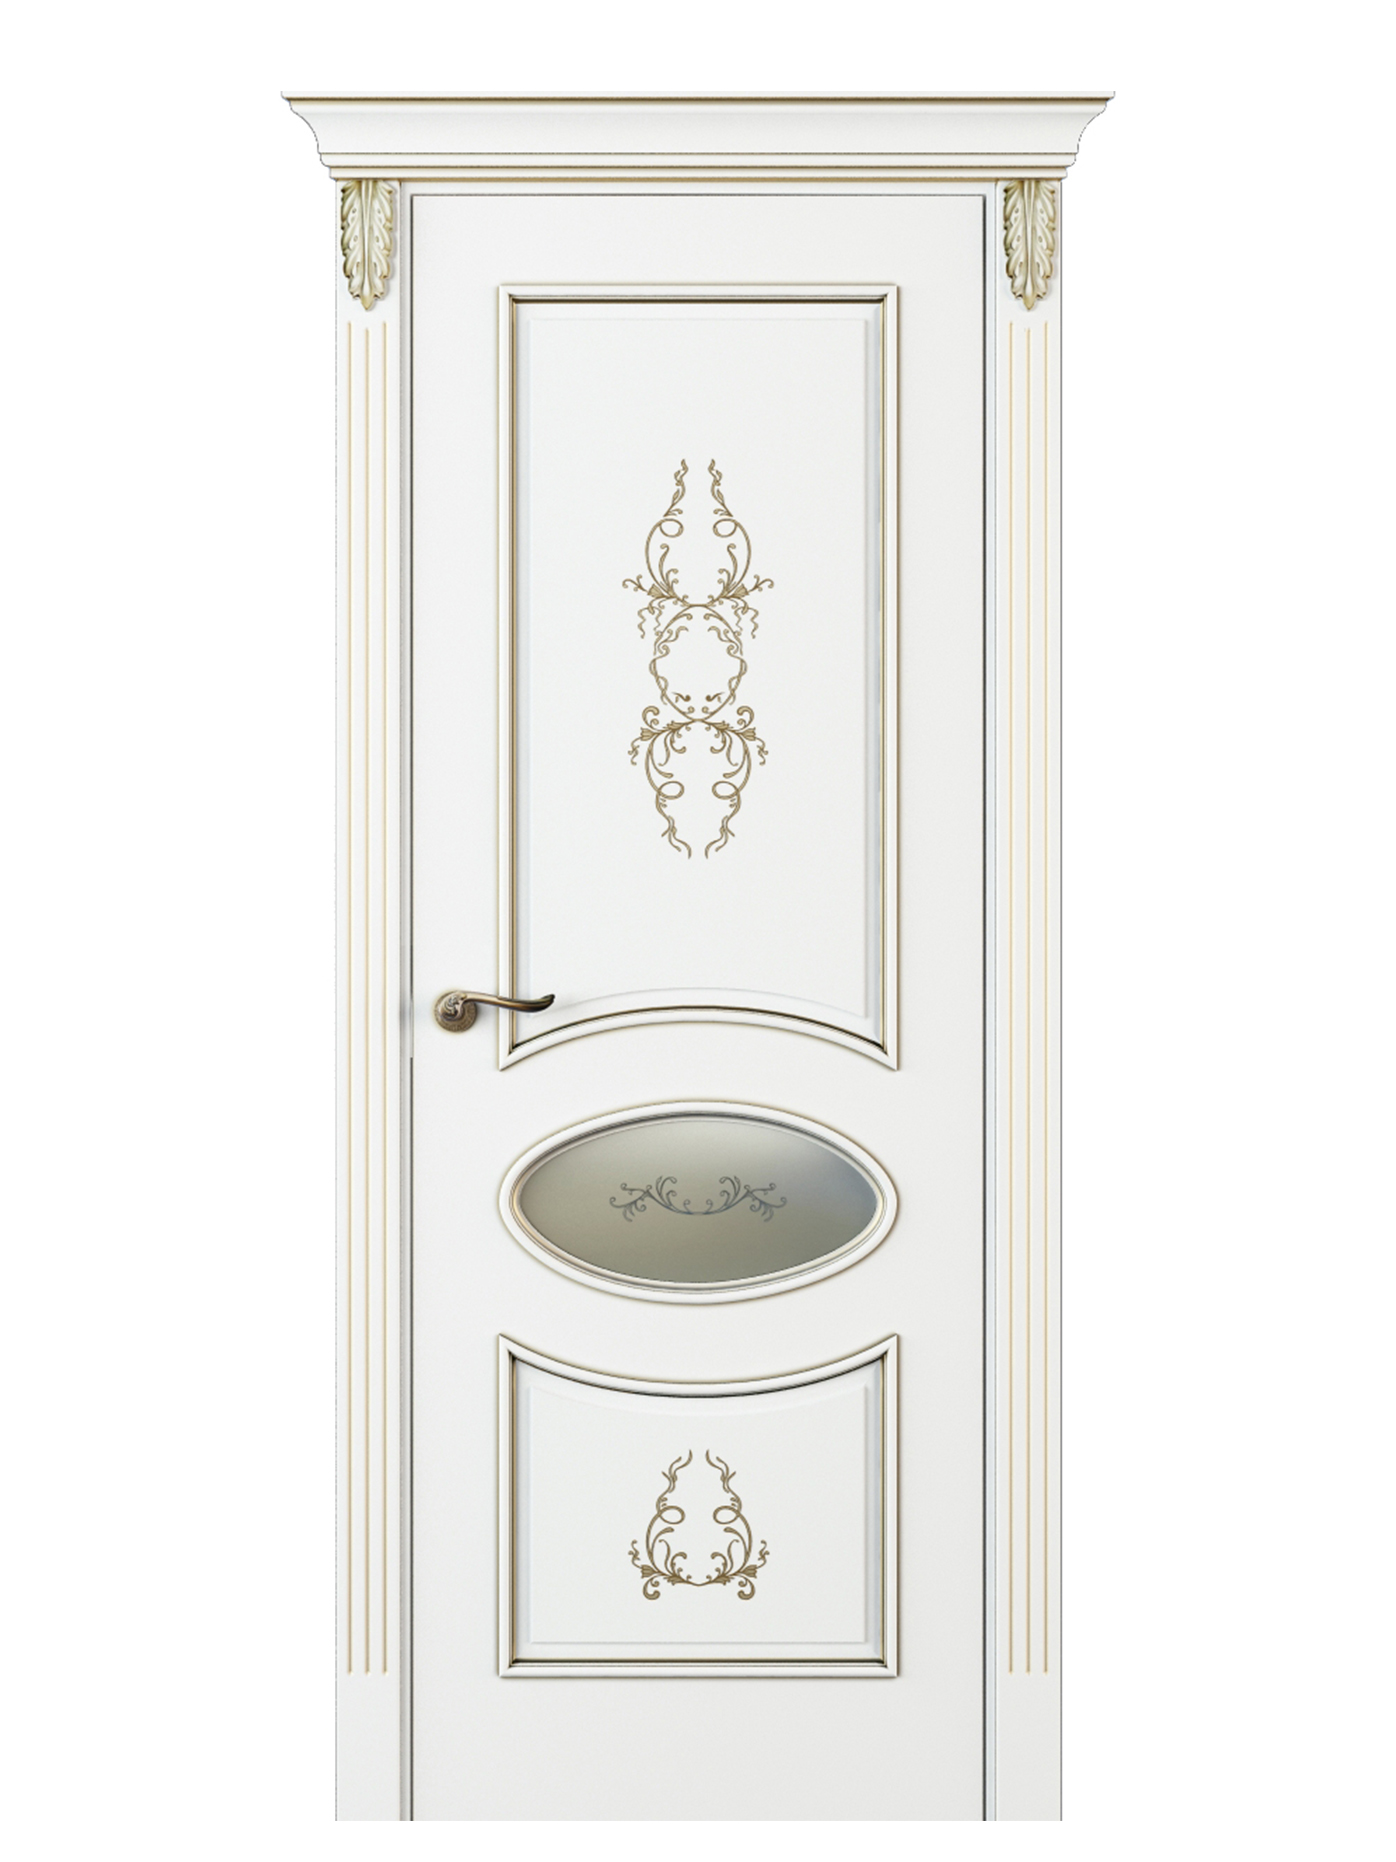 Image Nikkolo Inserto Interior Door Italian Enamel White 0